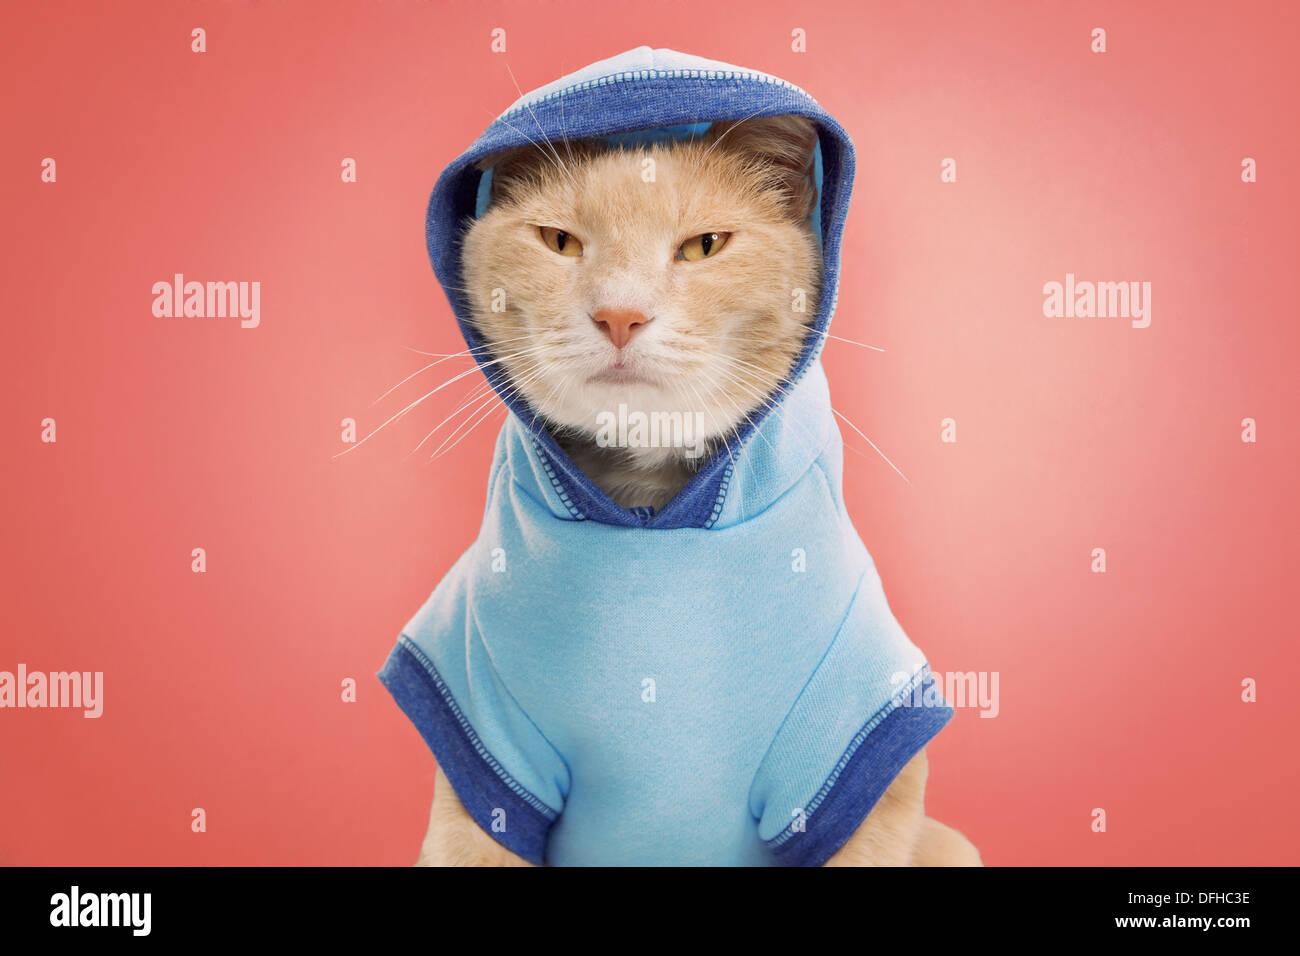 studio portrait of ginger cat wearing two tone blue sweatshirt with hoodie - Stock Image